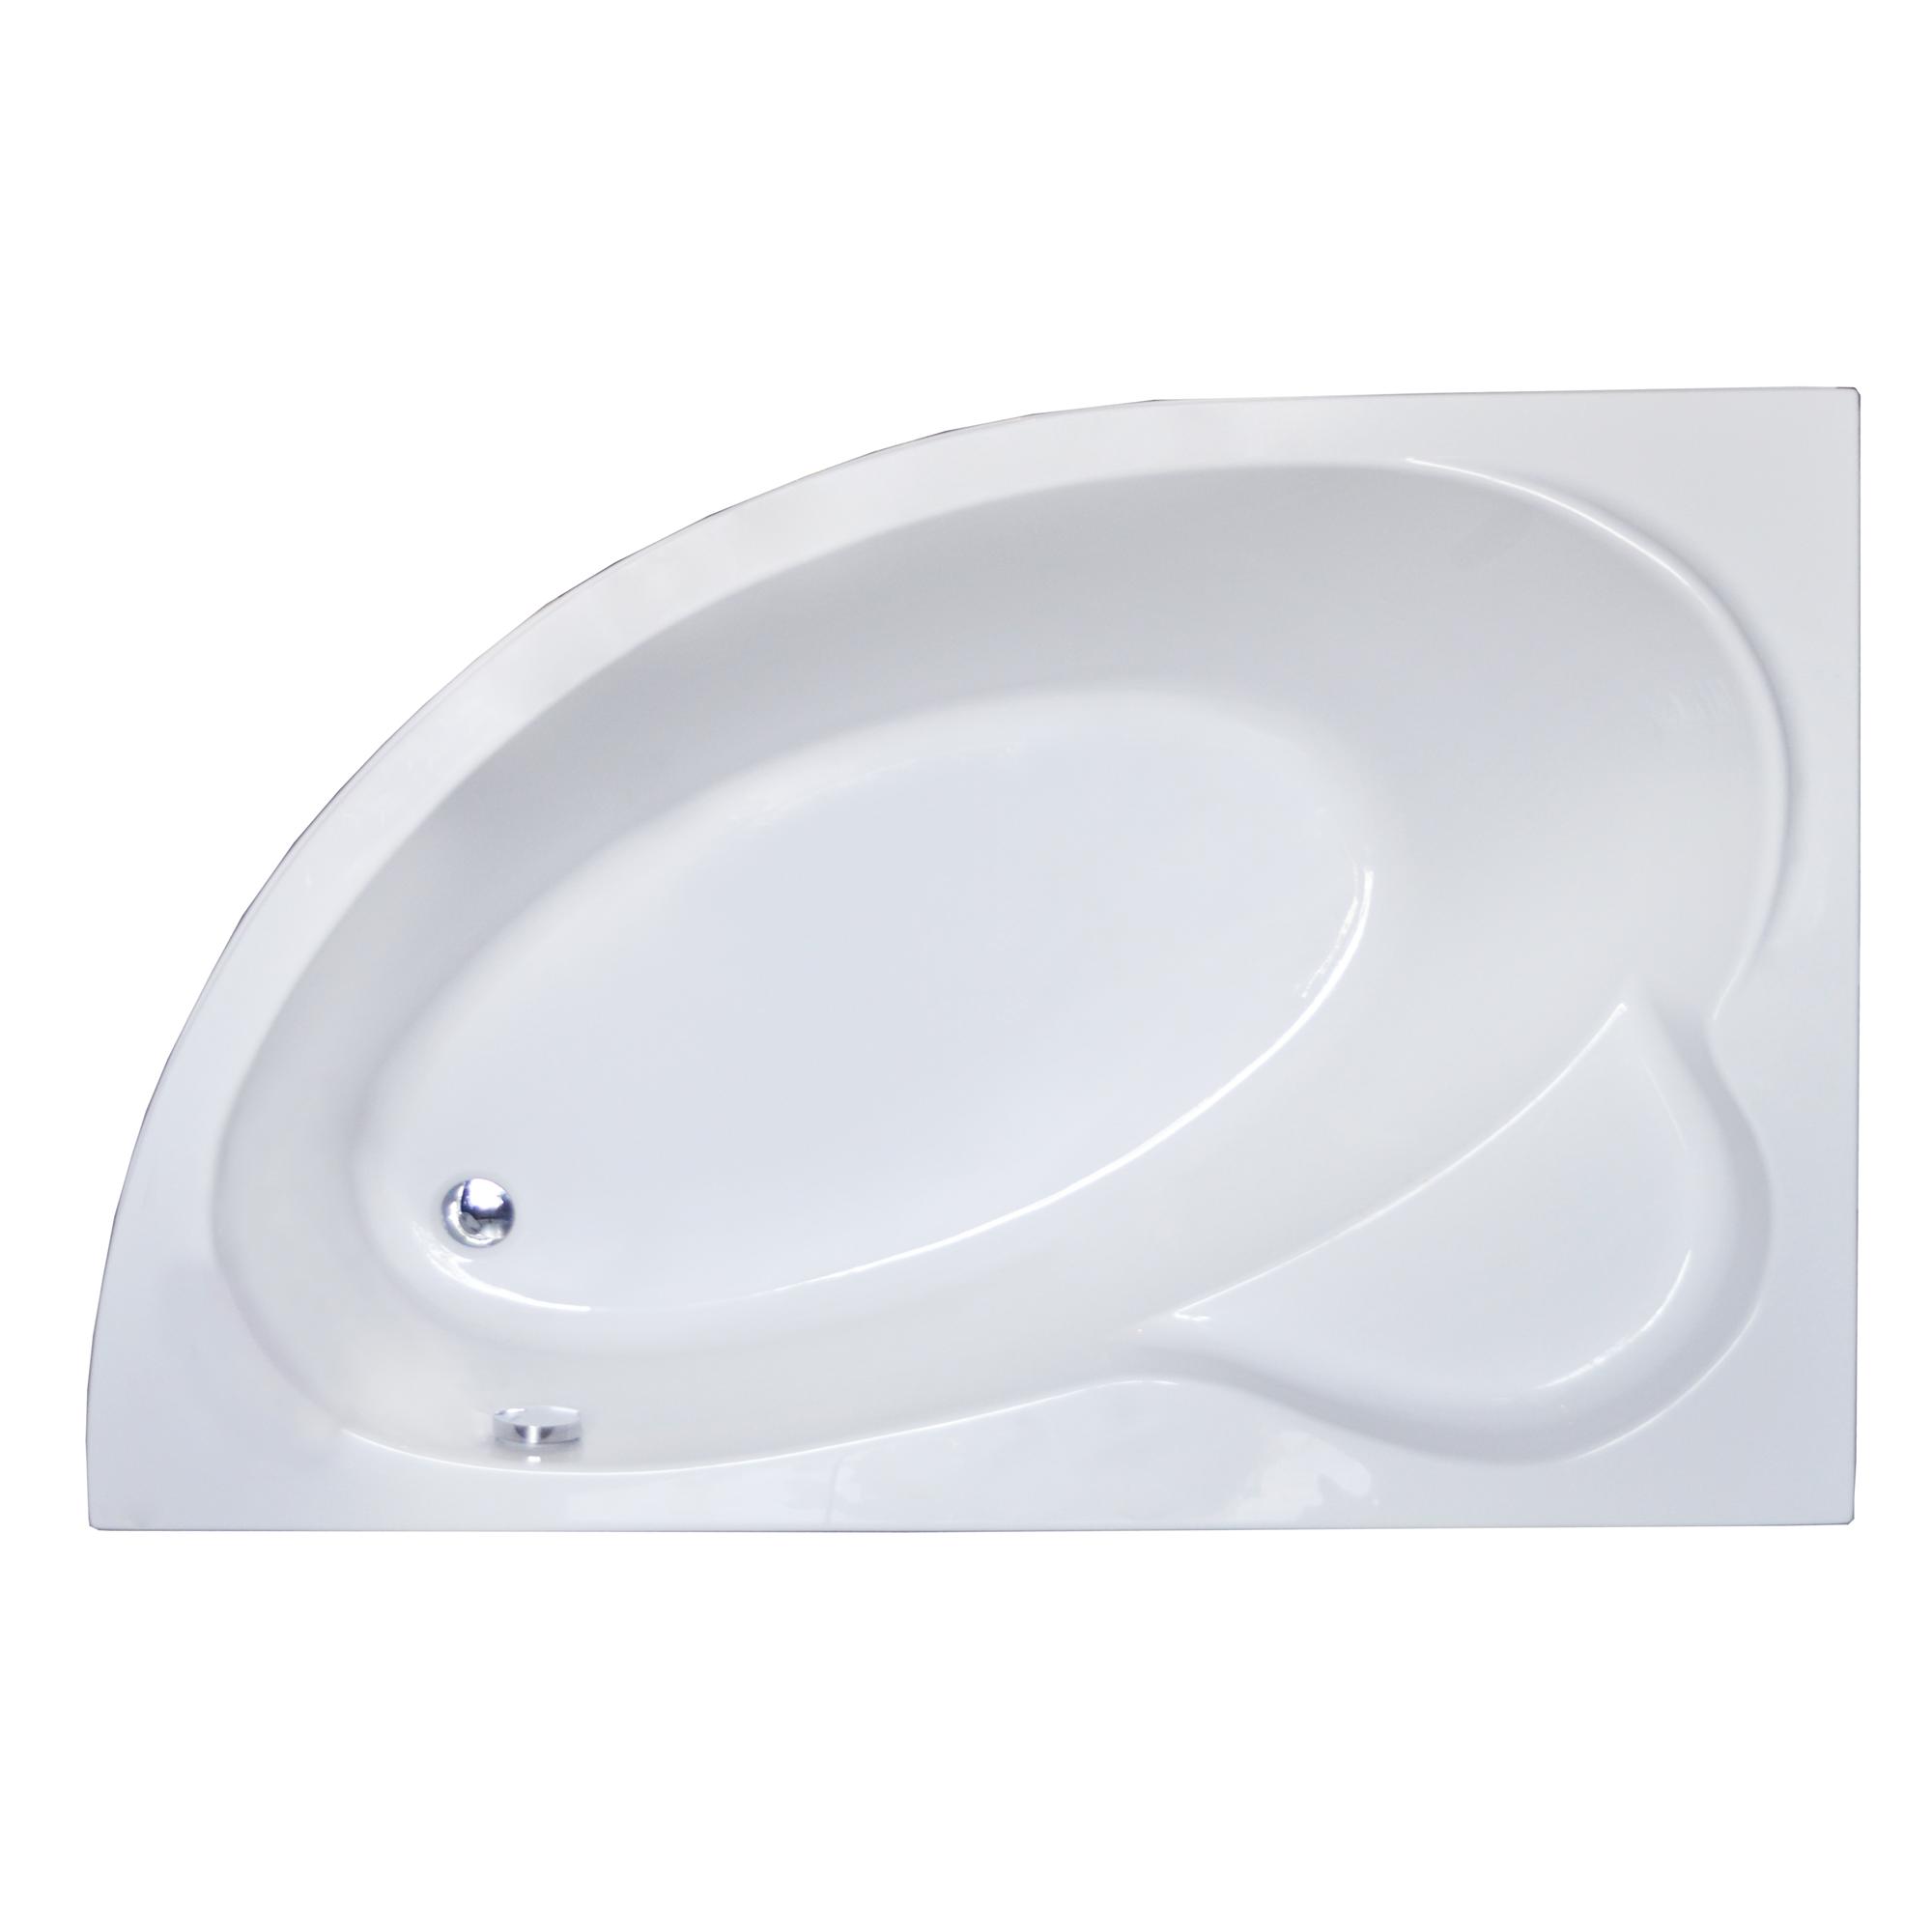 Акриловая ванна Royal bath Alpine RB819100 150х100 L акриловая ванна royal bath alpine rb 819101 правая 160х100 rb819101r